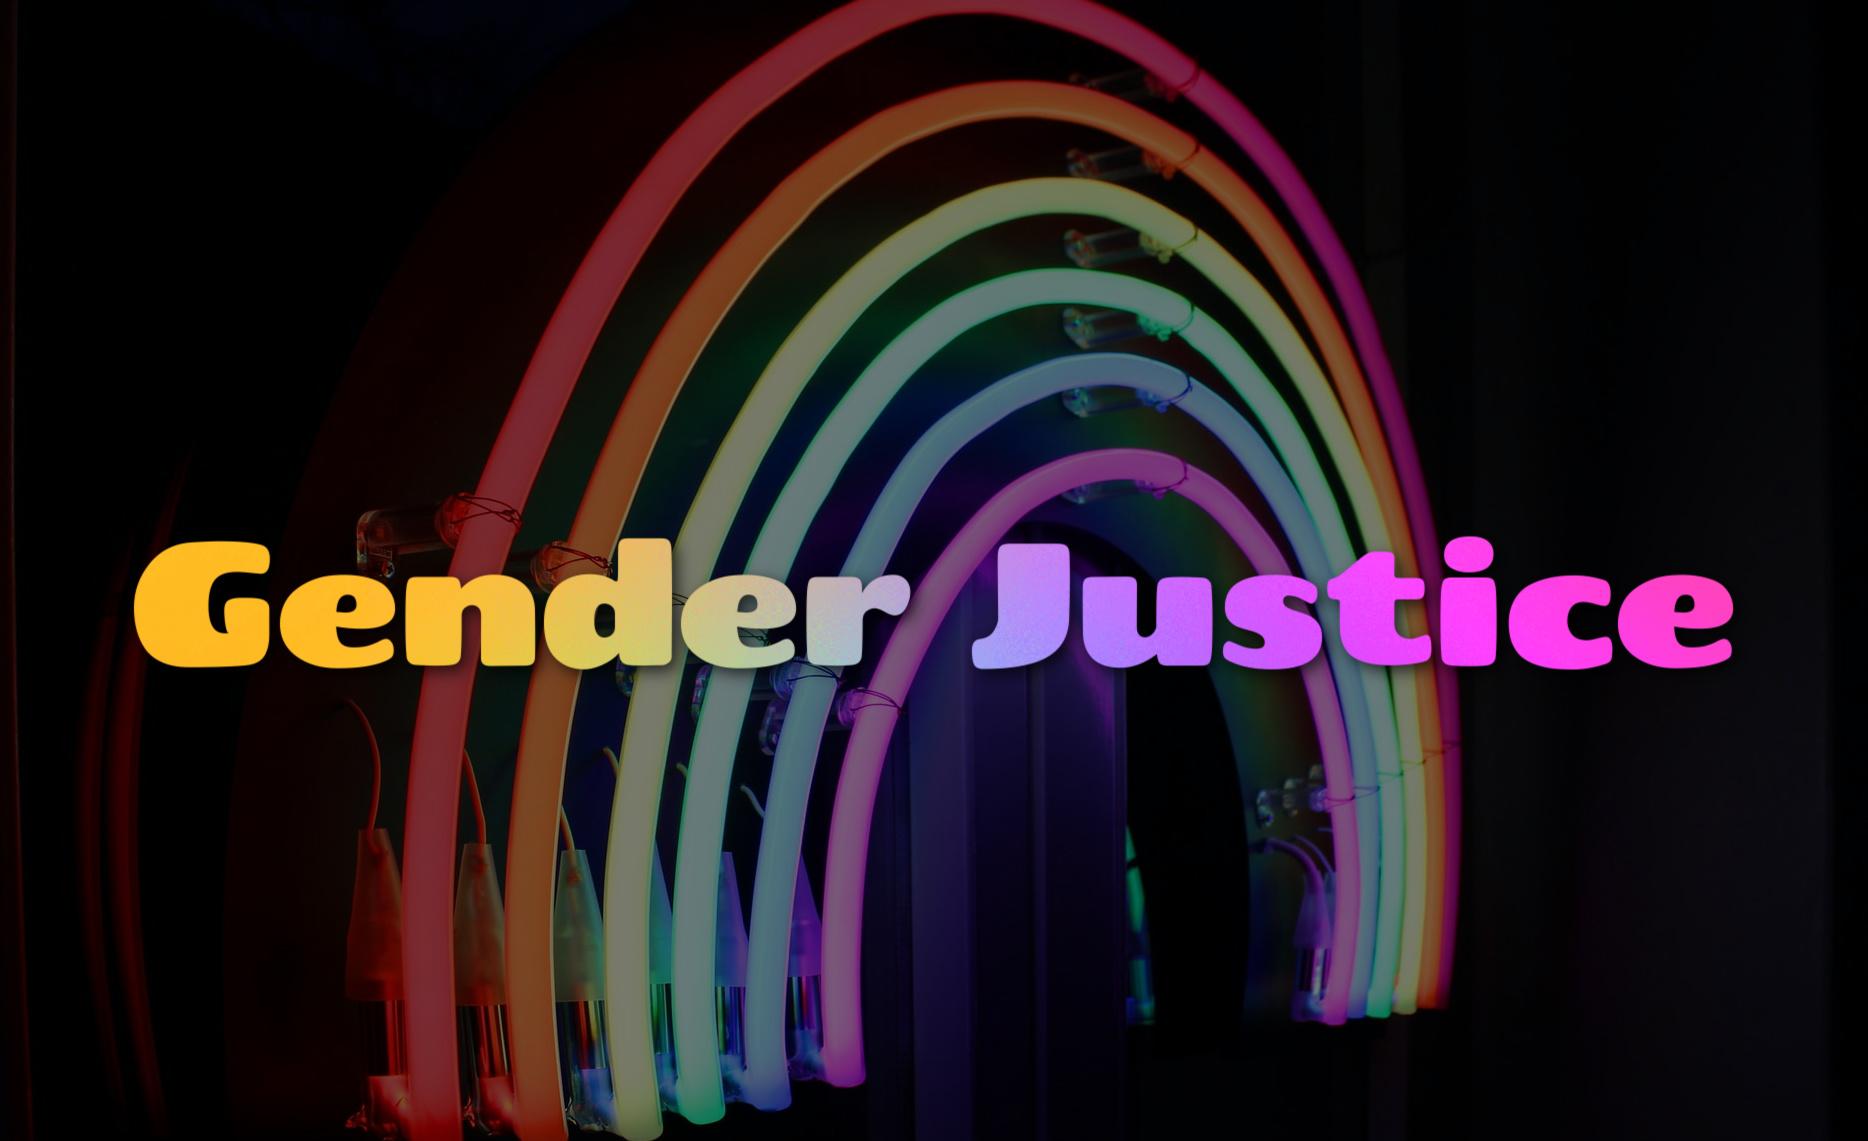 Transgender Rights & Advocacy